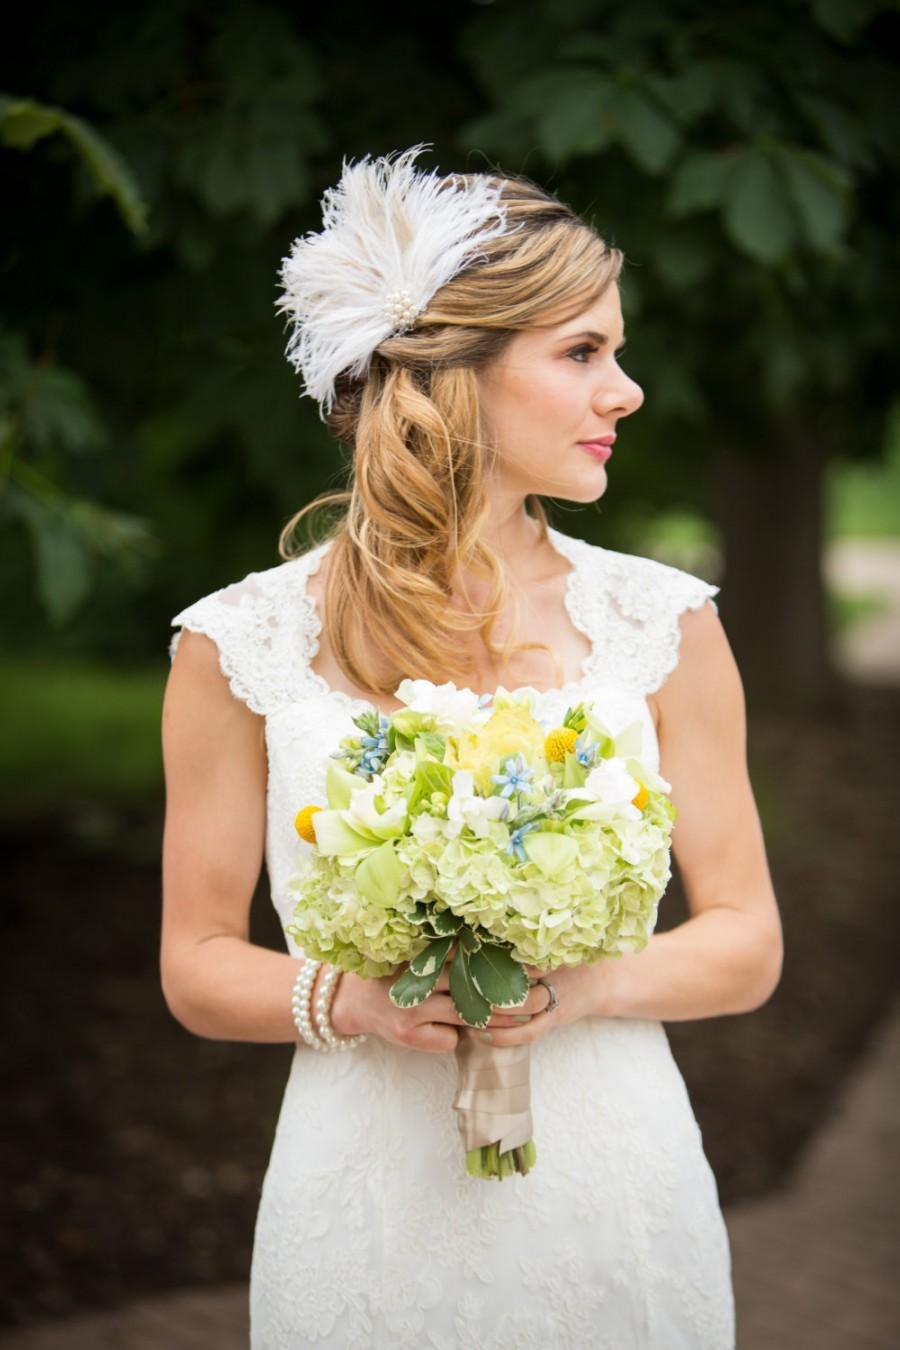 Mariage - Wedding Bridal Fascinator, Bridal Fascinator, Feather Fascinator , Wedding Veil, Bridal Headpiece - The Couture Bride